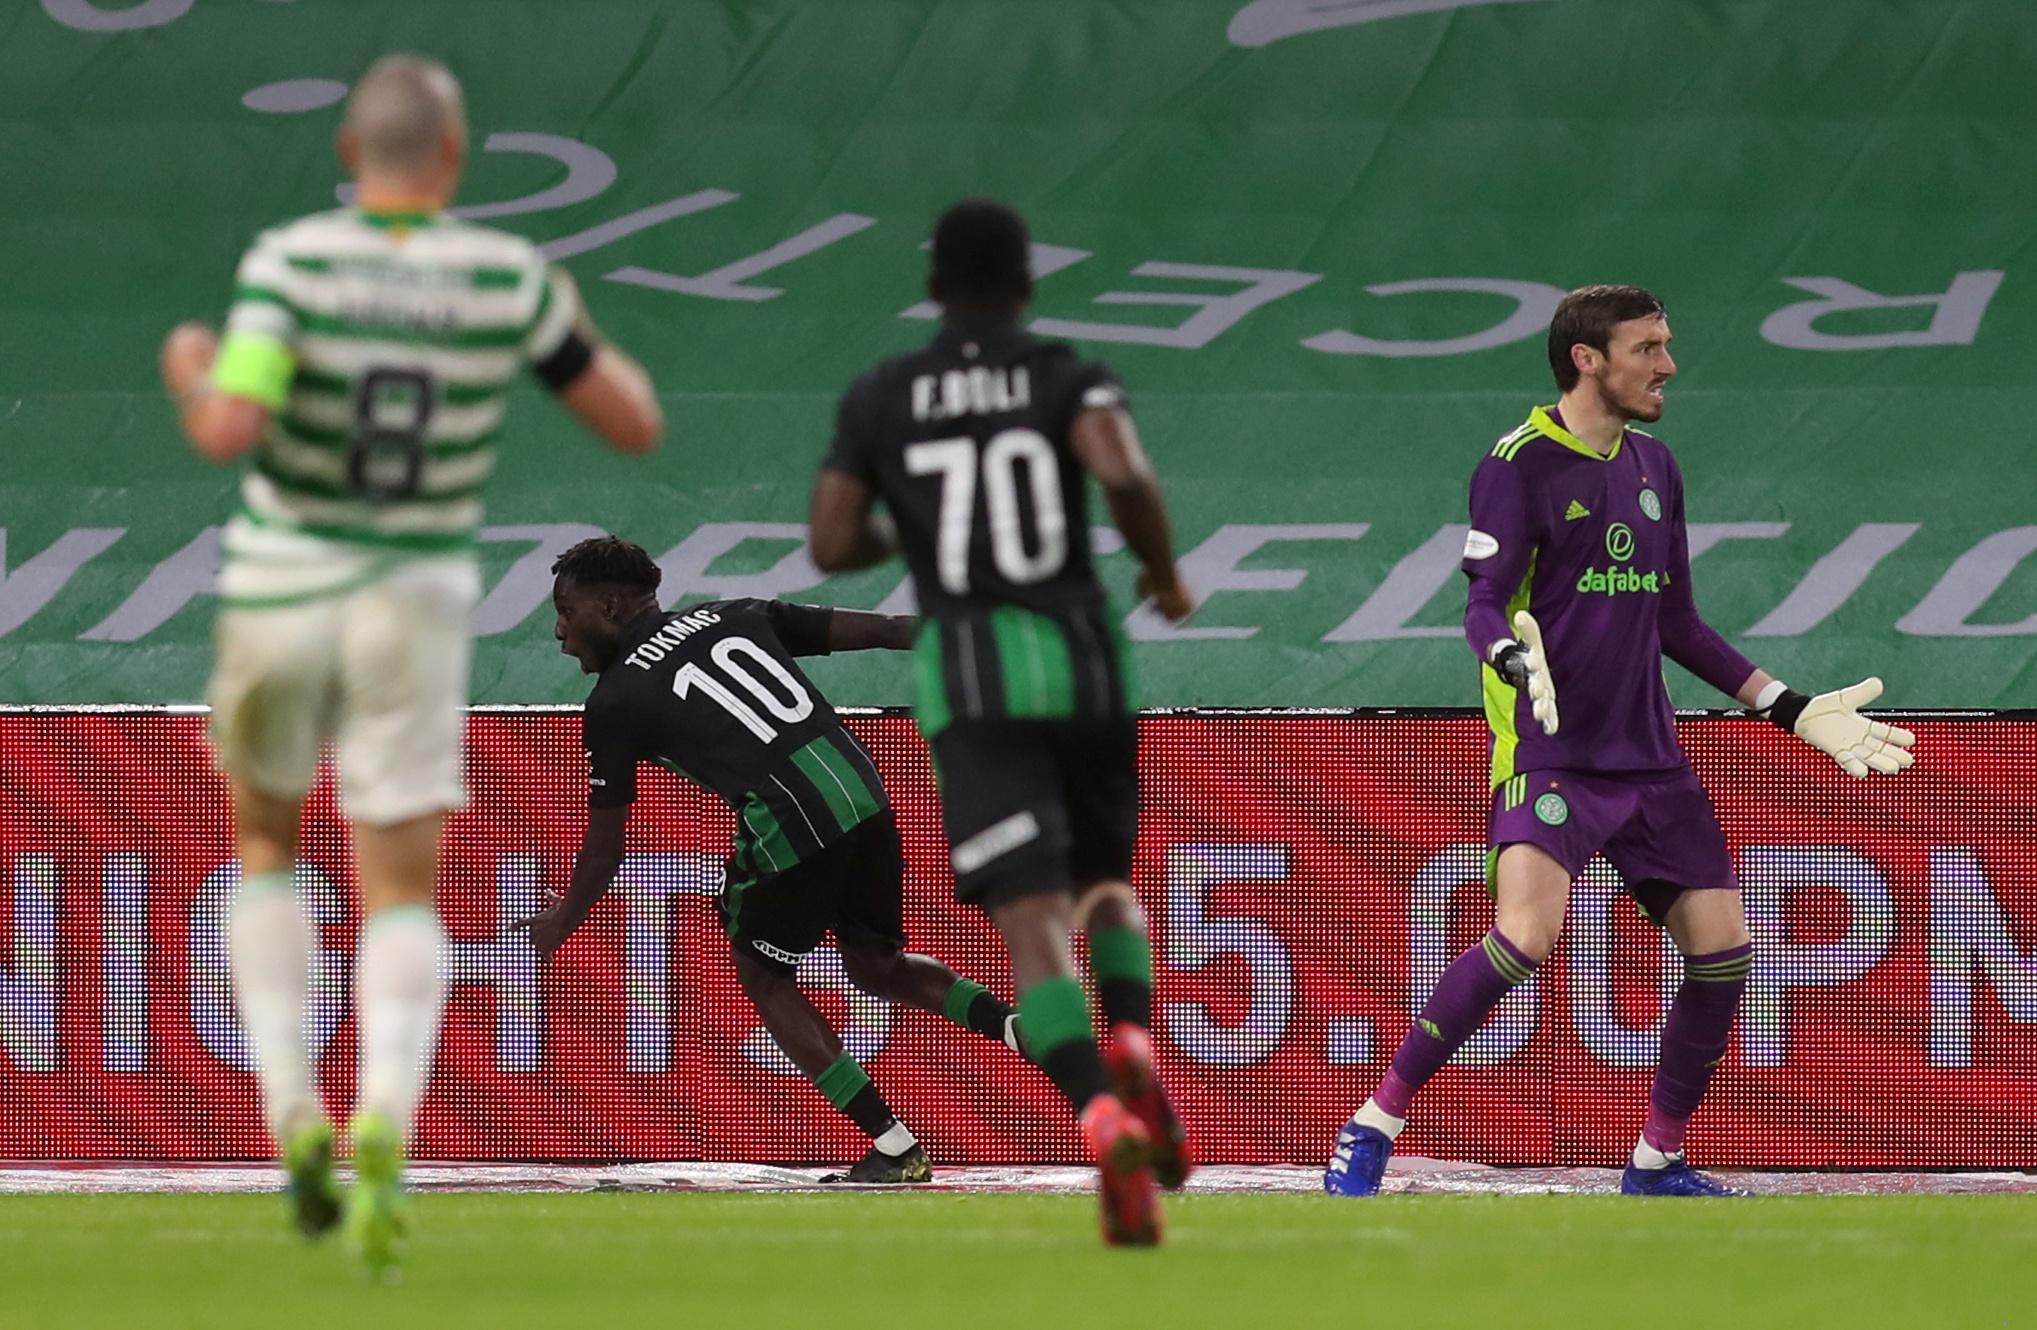 Champions League: Στον 3ο γύρο η Μακάμπι του Δώνη και η Ομόνοια – Αποκλεισμός για Μπάρκα